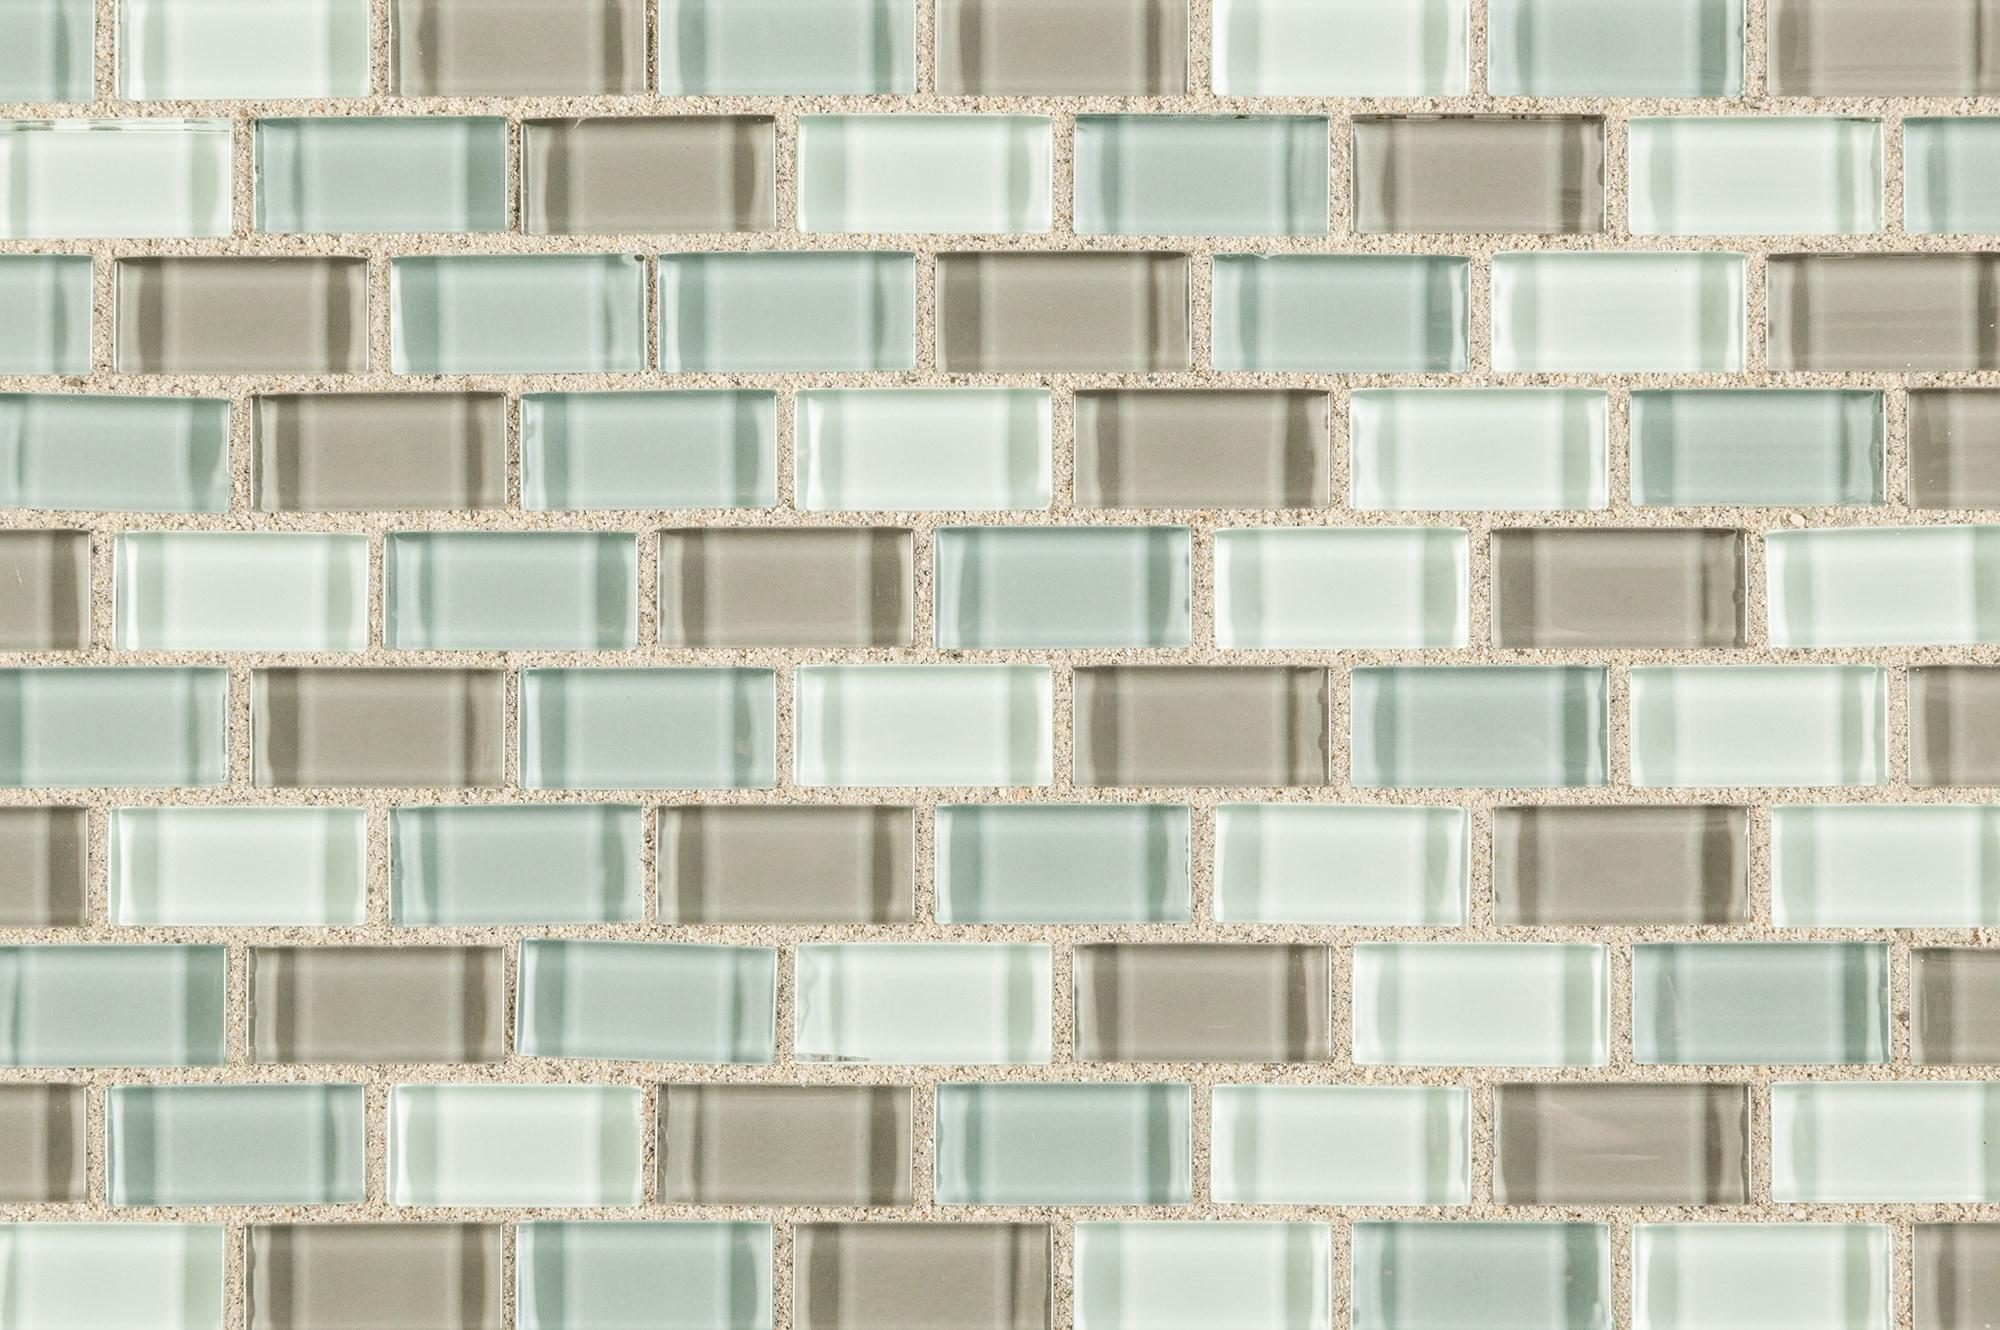 Majestic Ocean Mini Brick / Mini Brick Glass Mosaic - Crystalized Glass Blend Series 0